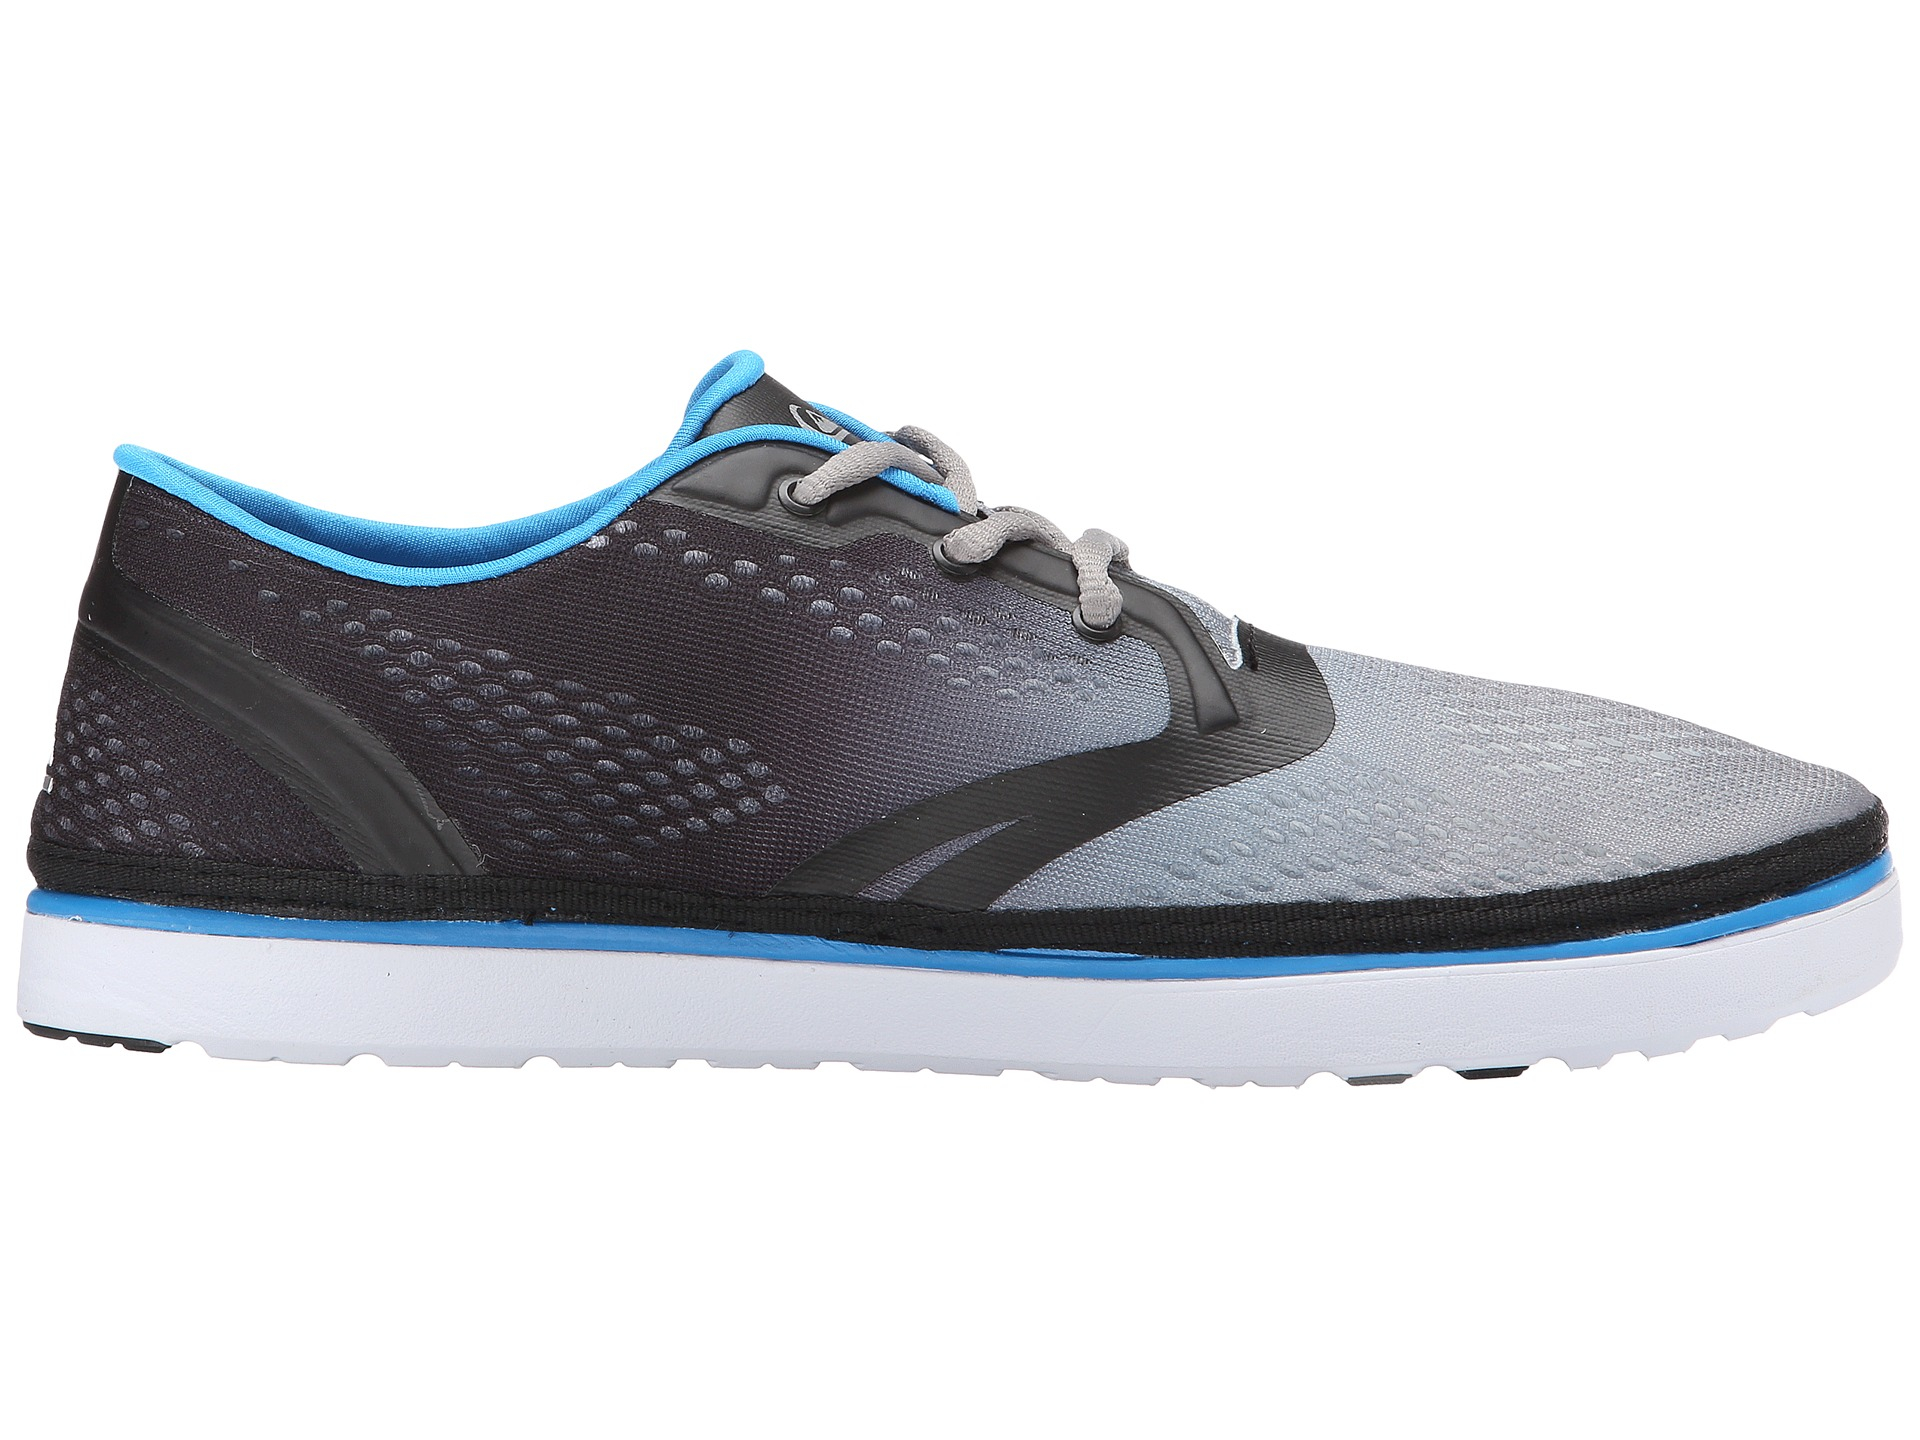 029511e8 Quiksilver Ag47 Amphibian Shoe in Black for Men - Lyst